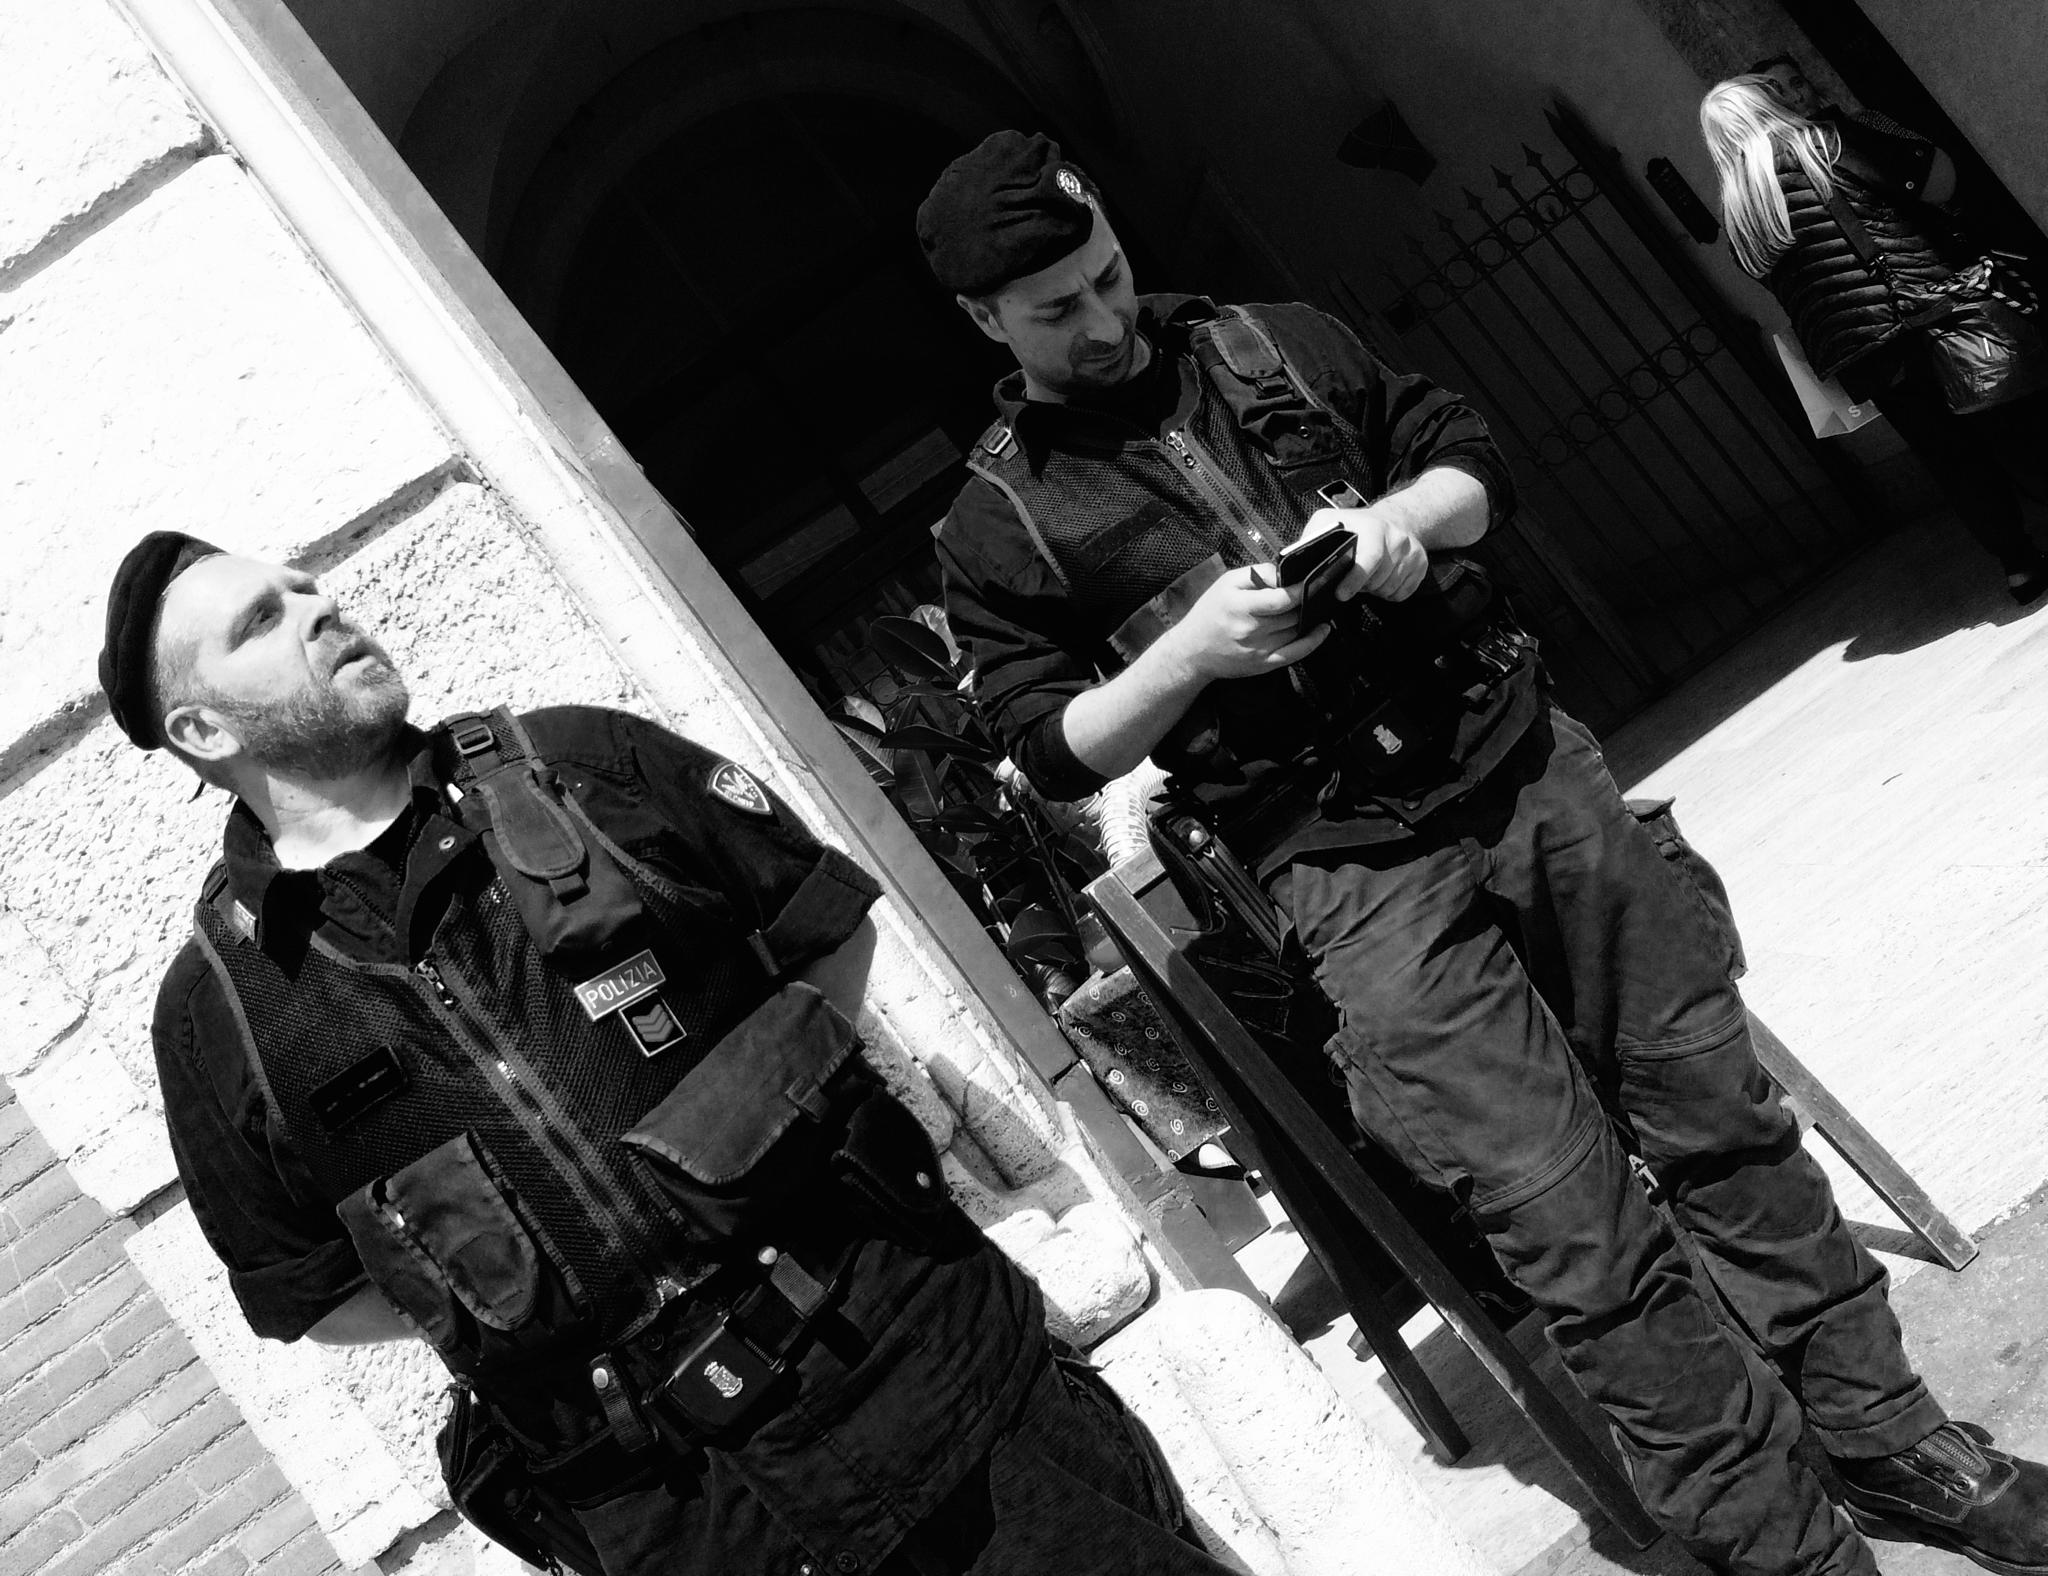 Polizia 101 by coiatellimarco